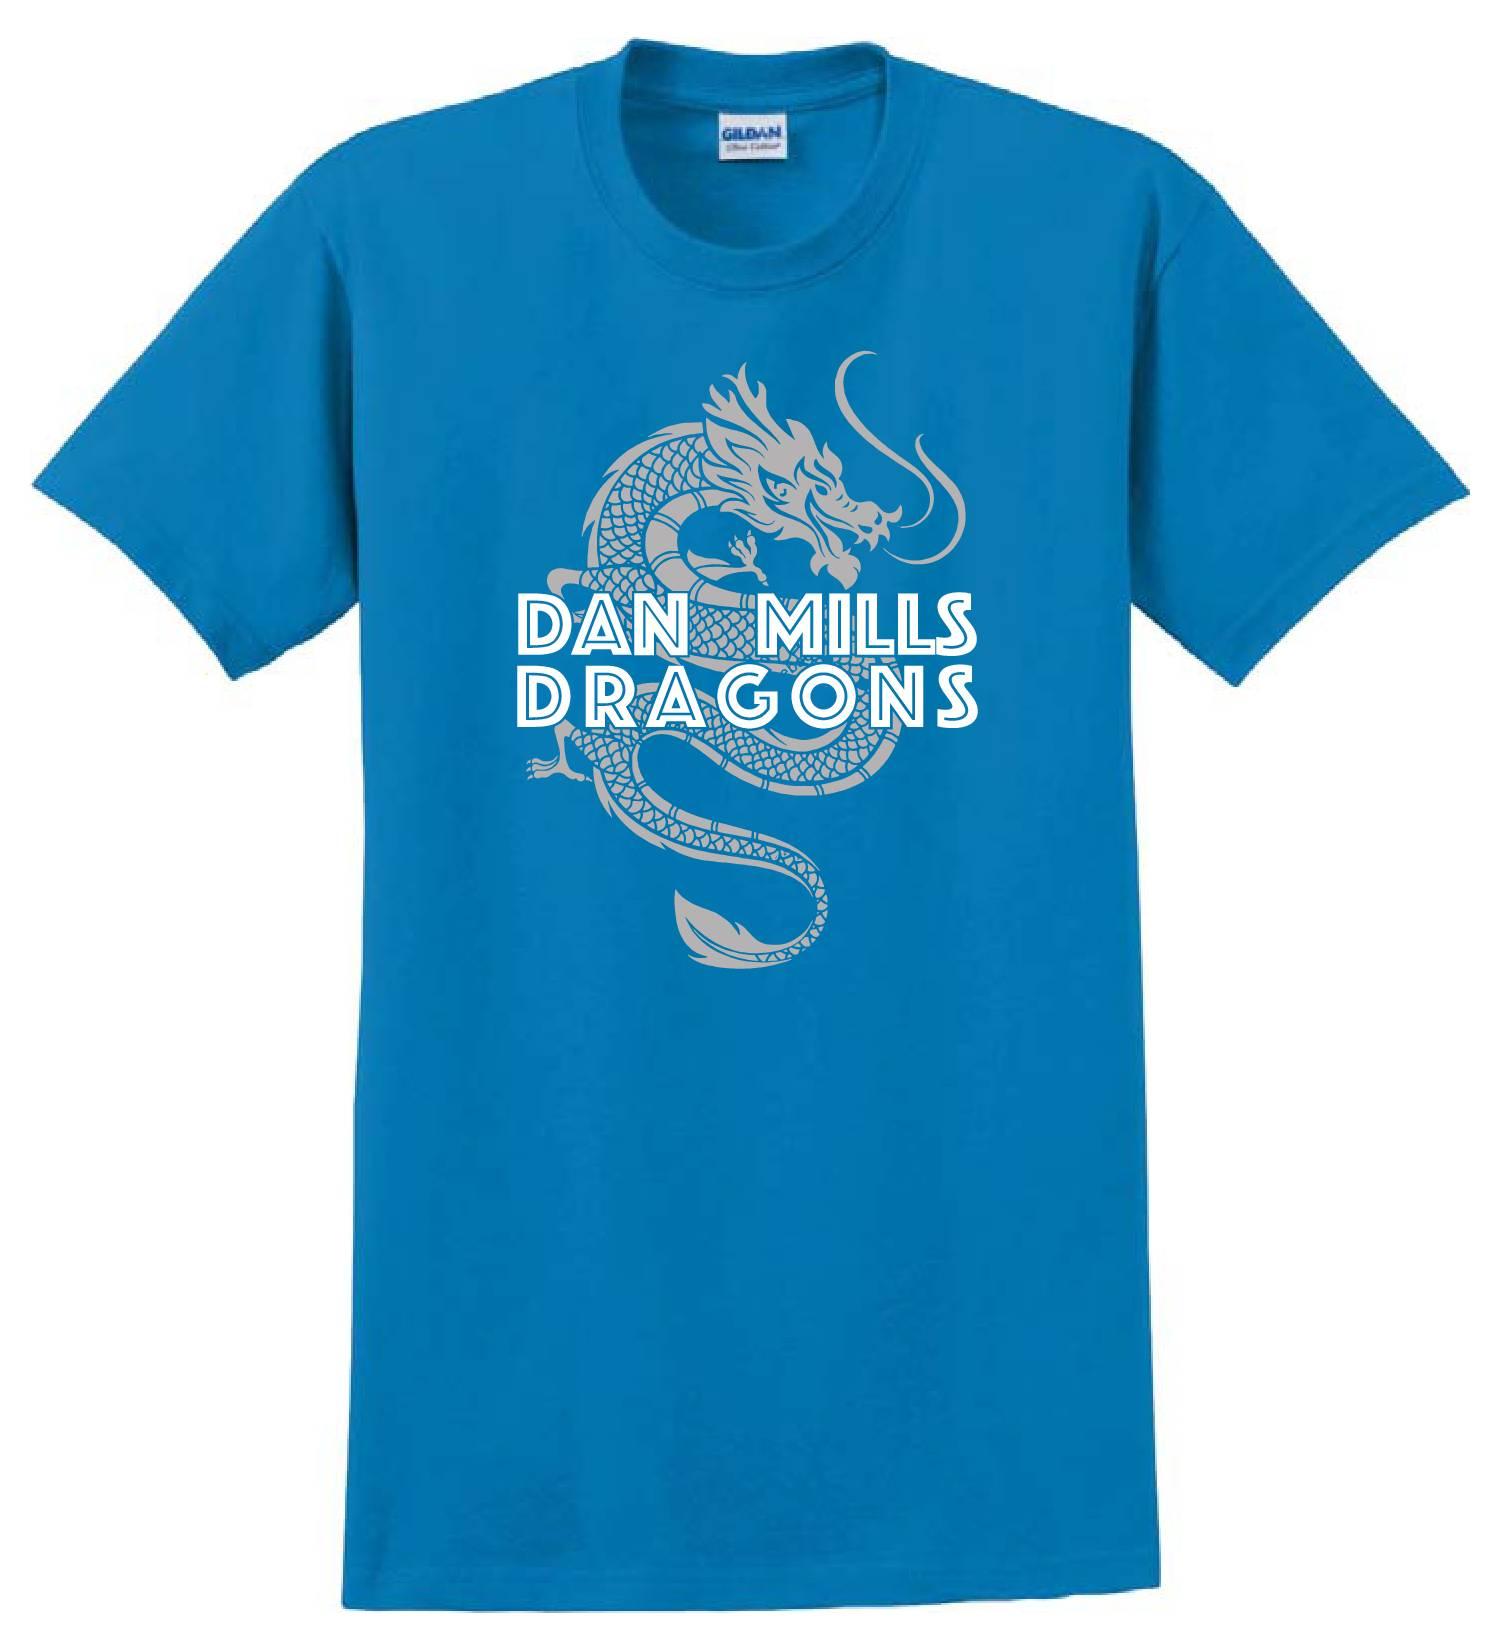 Proofs Dan Mills Dragons ff-1.jpg